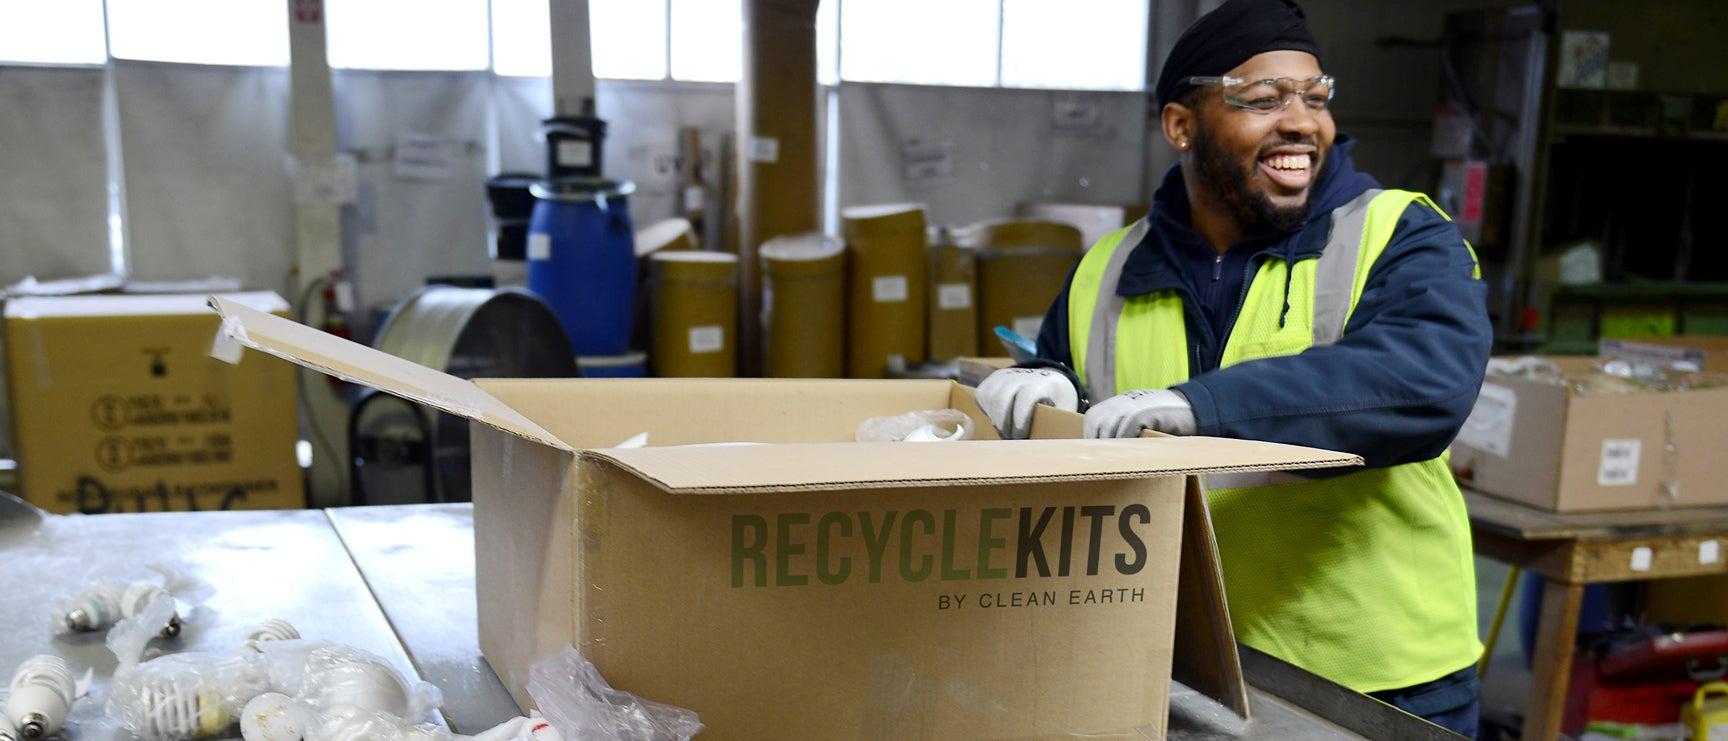 RecycleKits